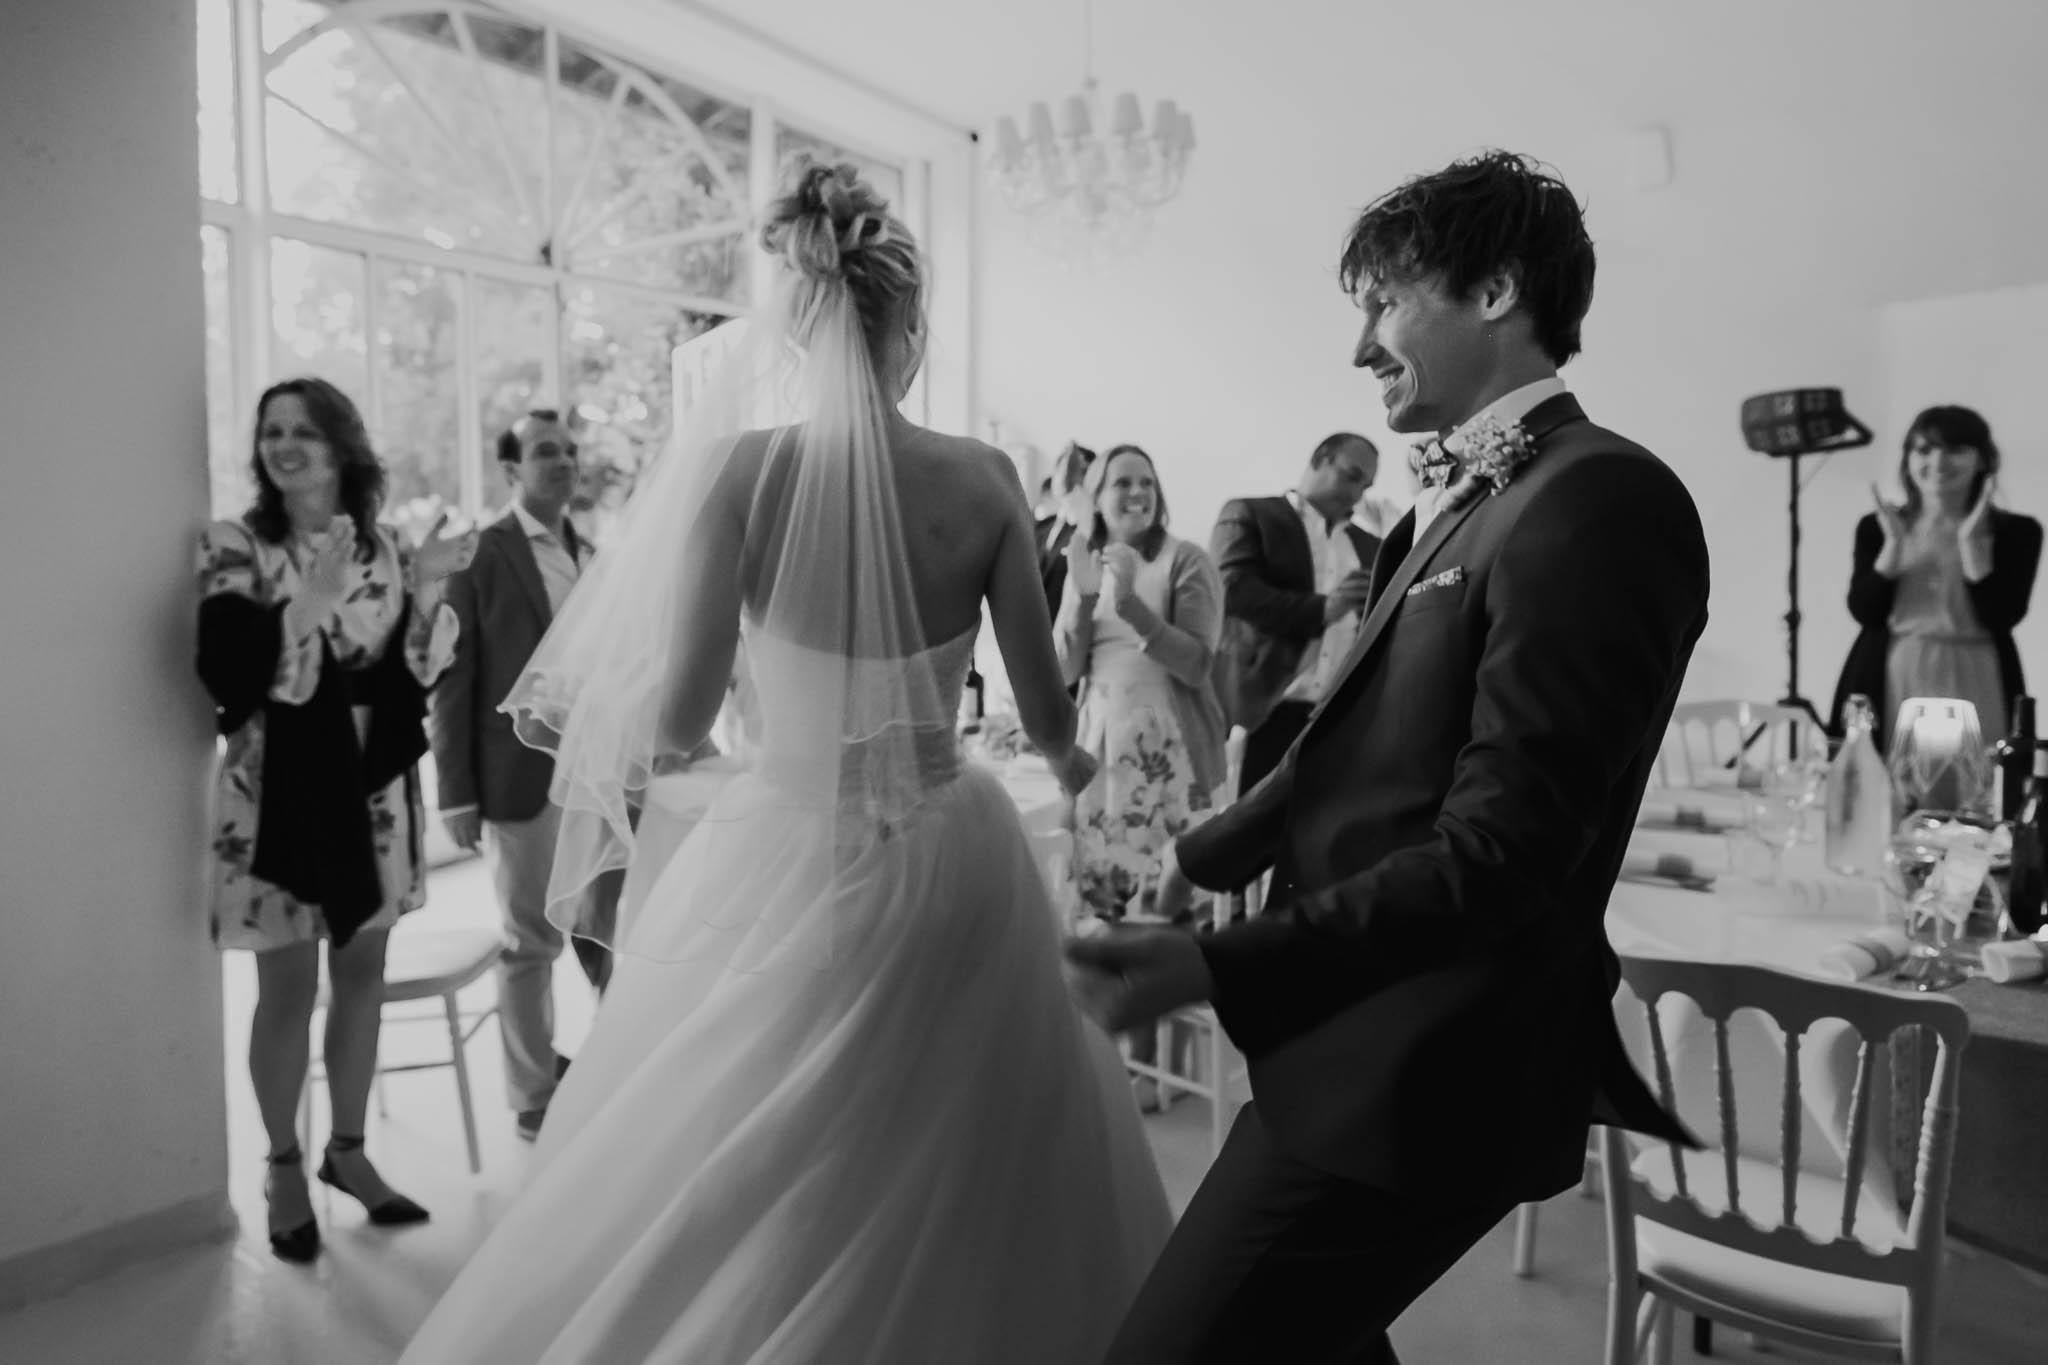 mariage-chateau-gaudras-ingold-95.jpg